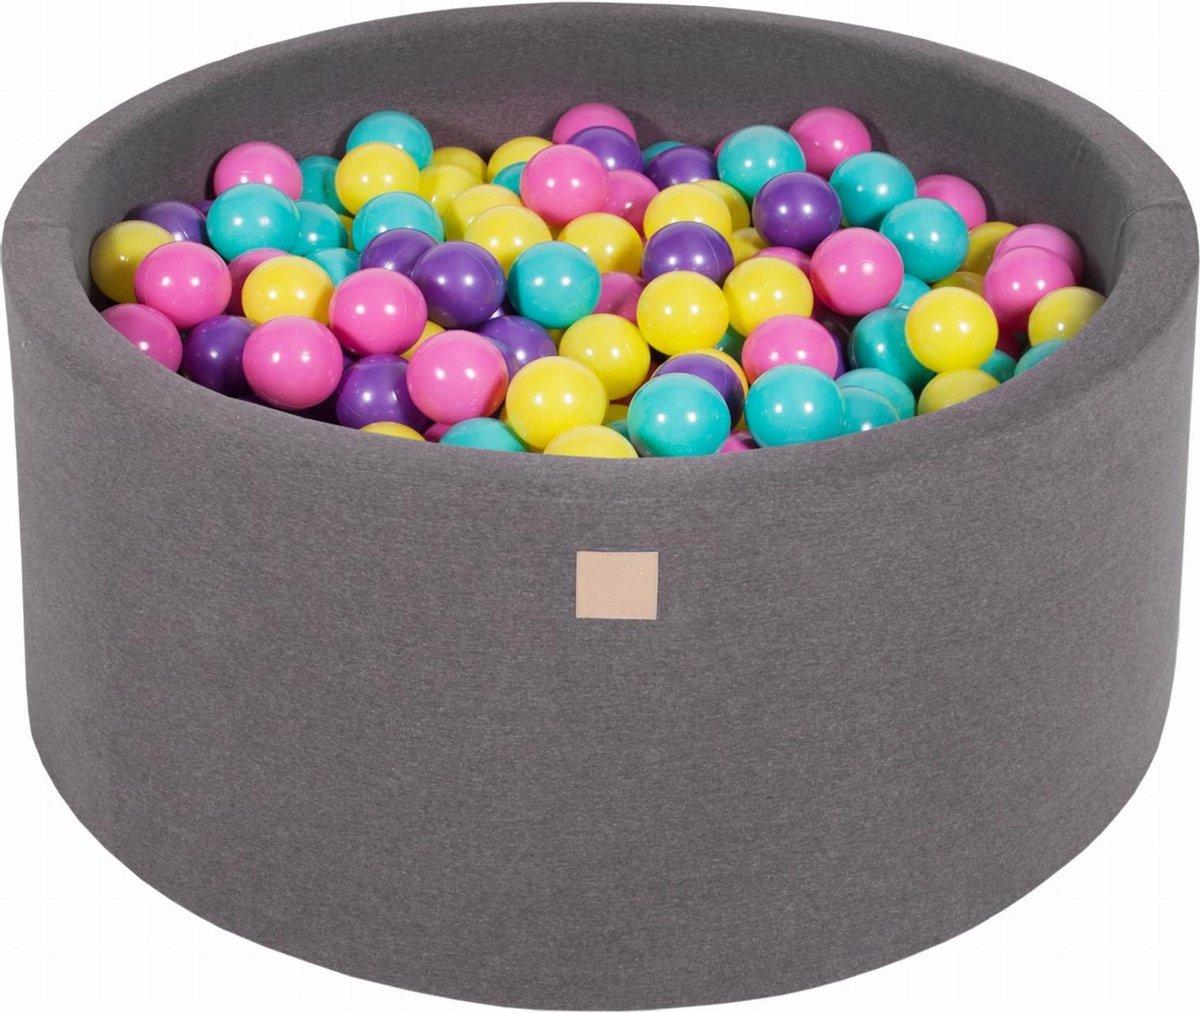 Ronde Ballenbak set incl 300 ballen 90x40cm - Donker Grijs: Violet, Donker Roze, Lime, Turquoise